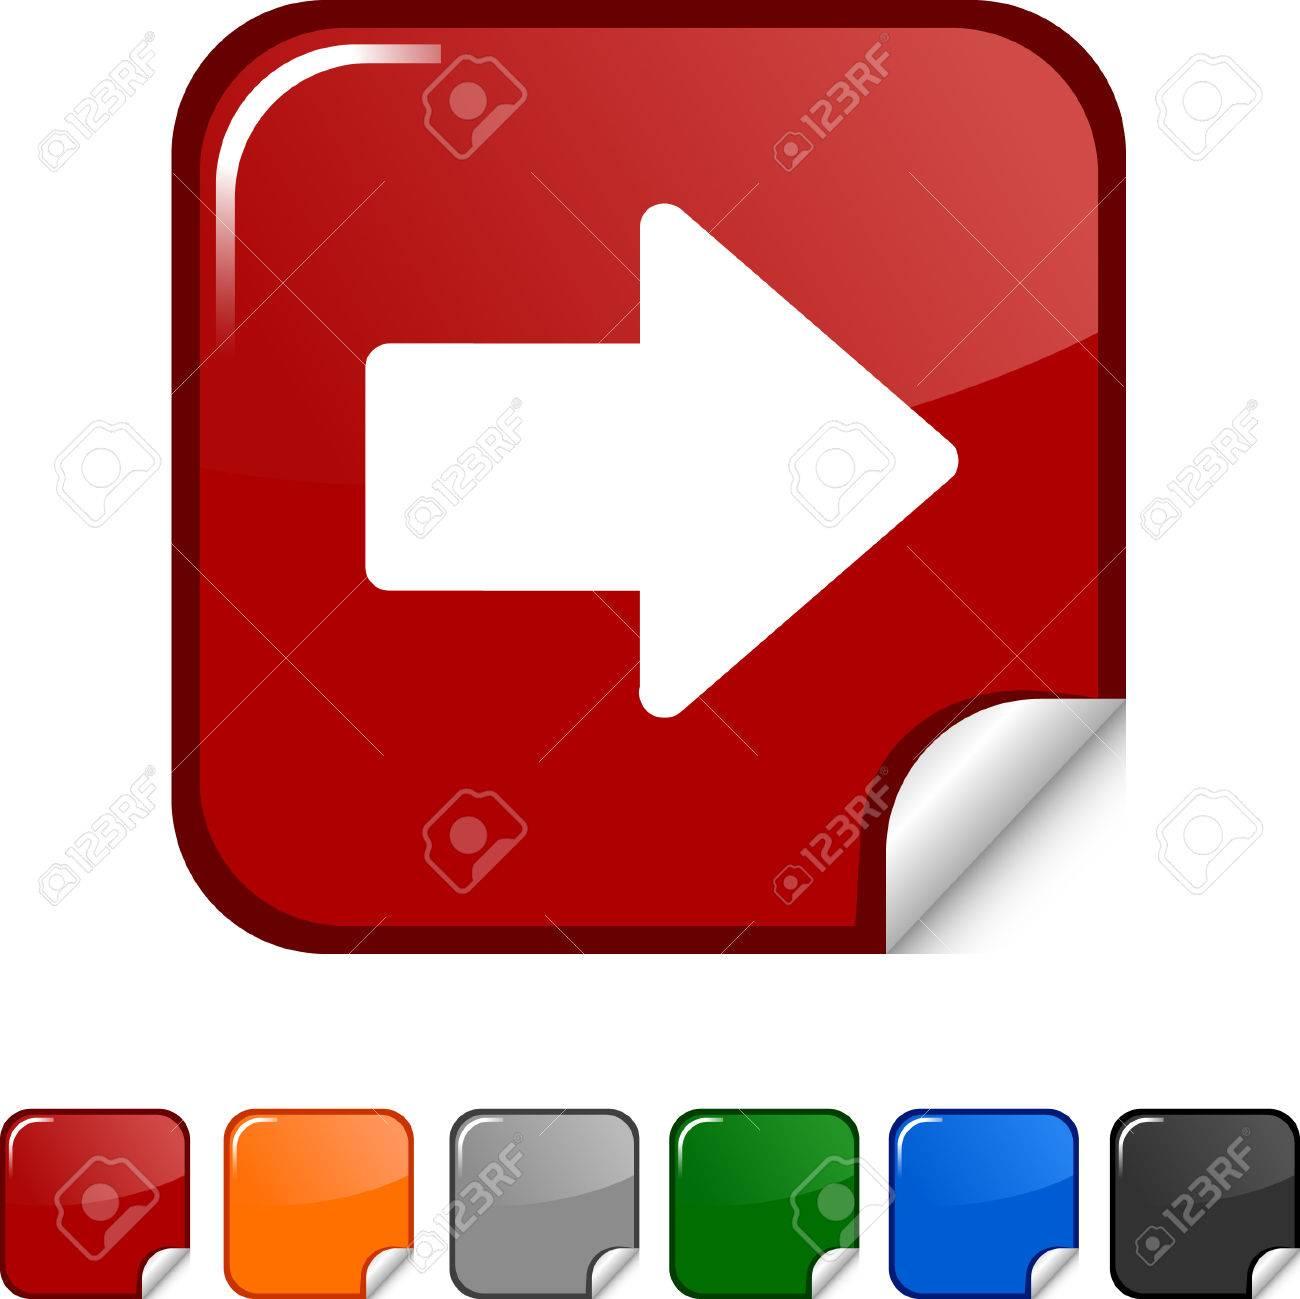 Arrow  sticker icon. Vector illustration. Stock Vector - 5617897